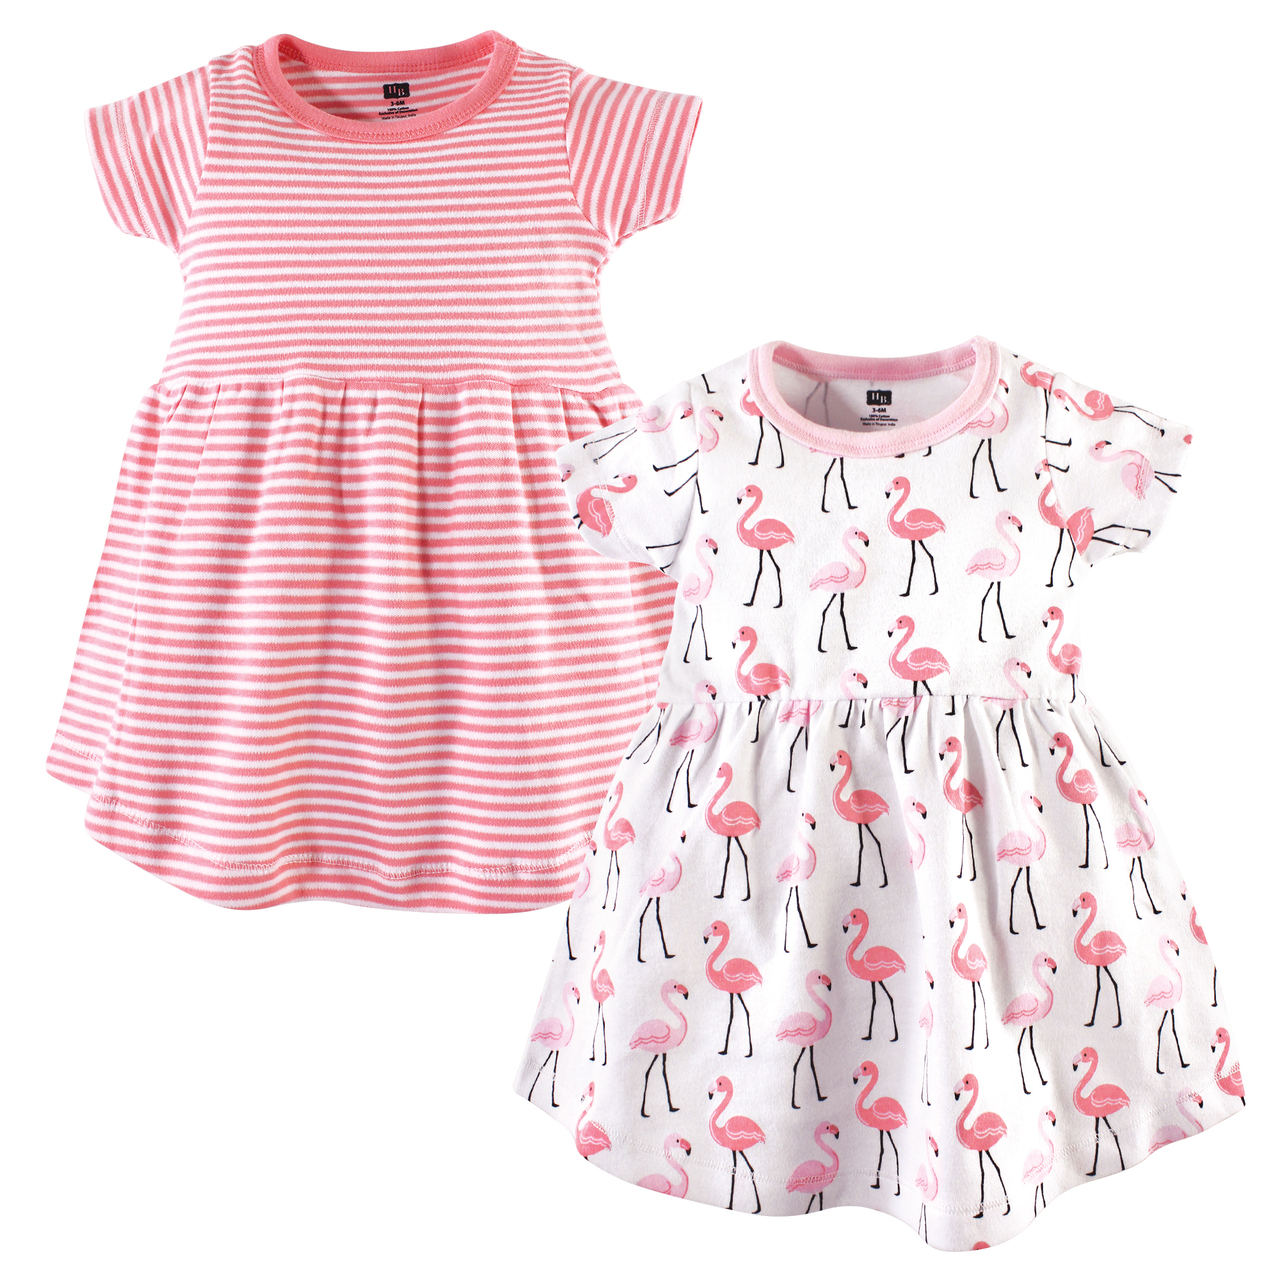 Hudson Baby Girls Cotton Dresses